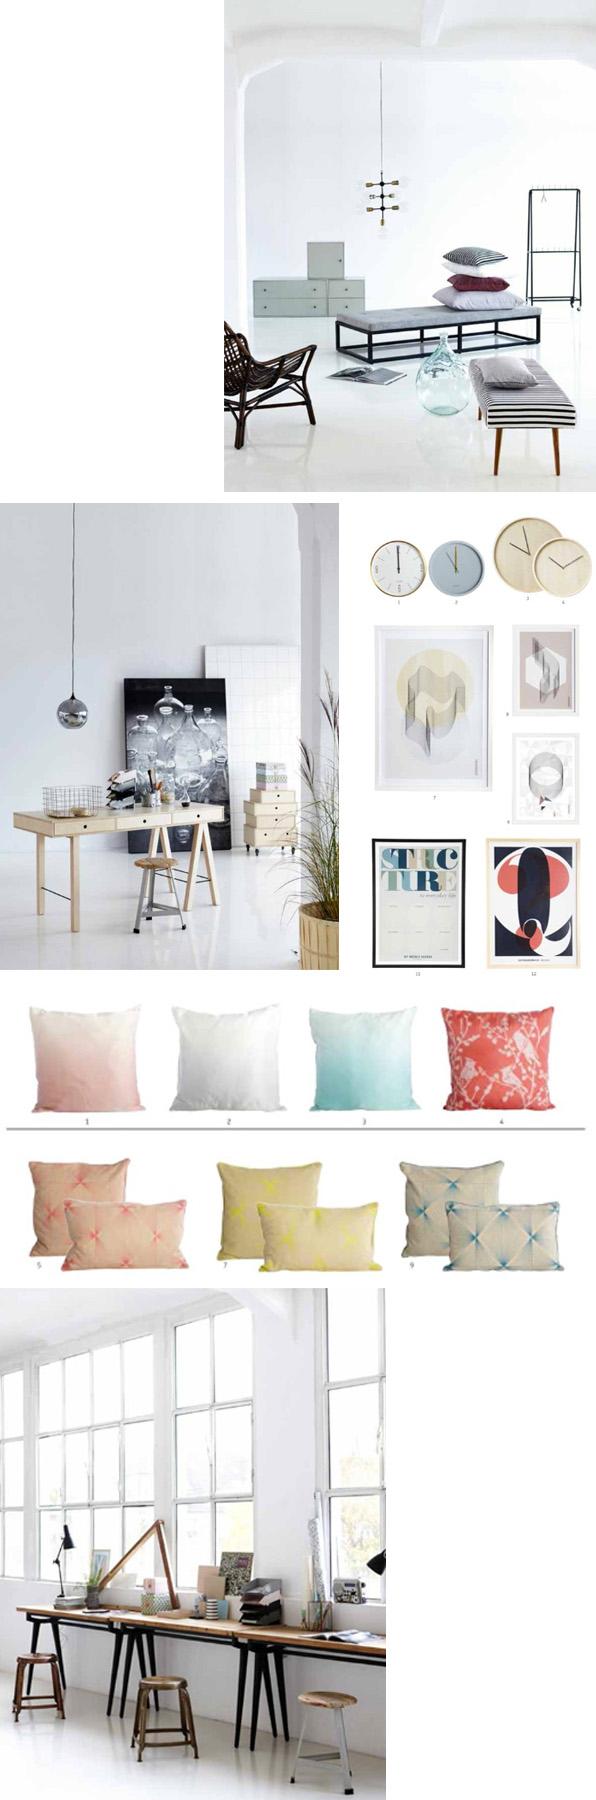 01 diseño nordico nordicdesign de © housedoctor en modus-vivendi